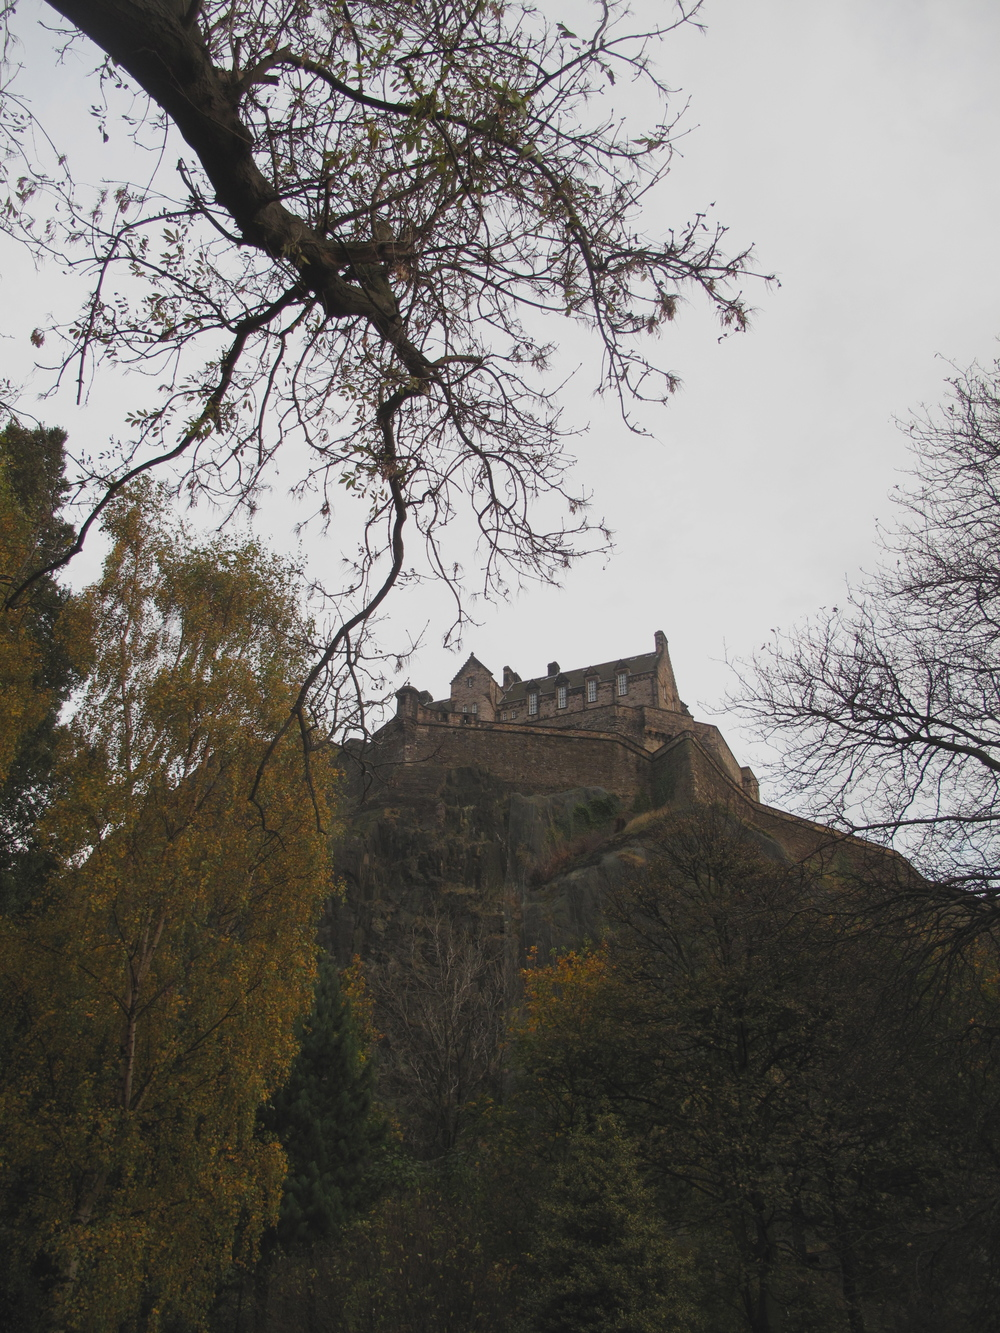 Edinburgh Castle framed by autumn and winter trees - spooky castle on a cliff.